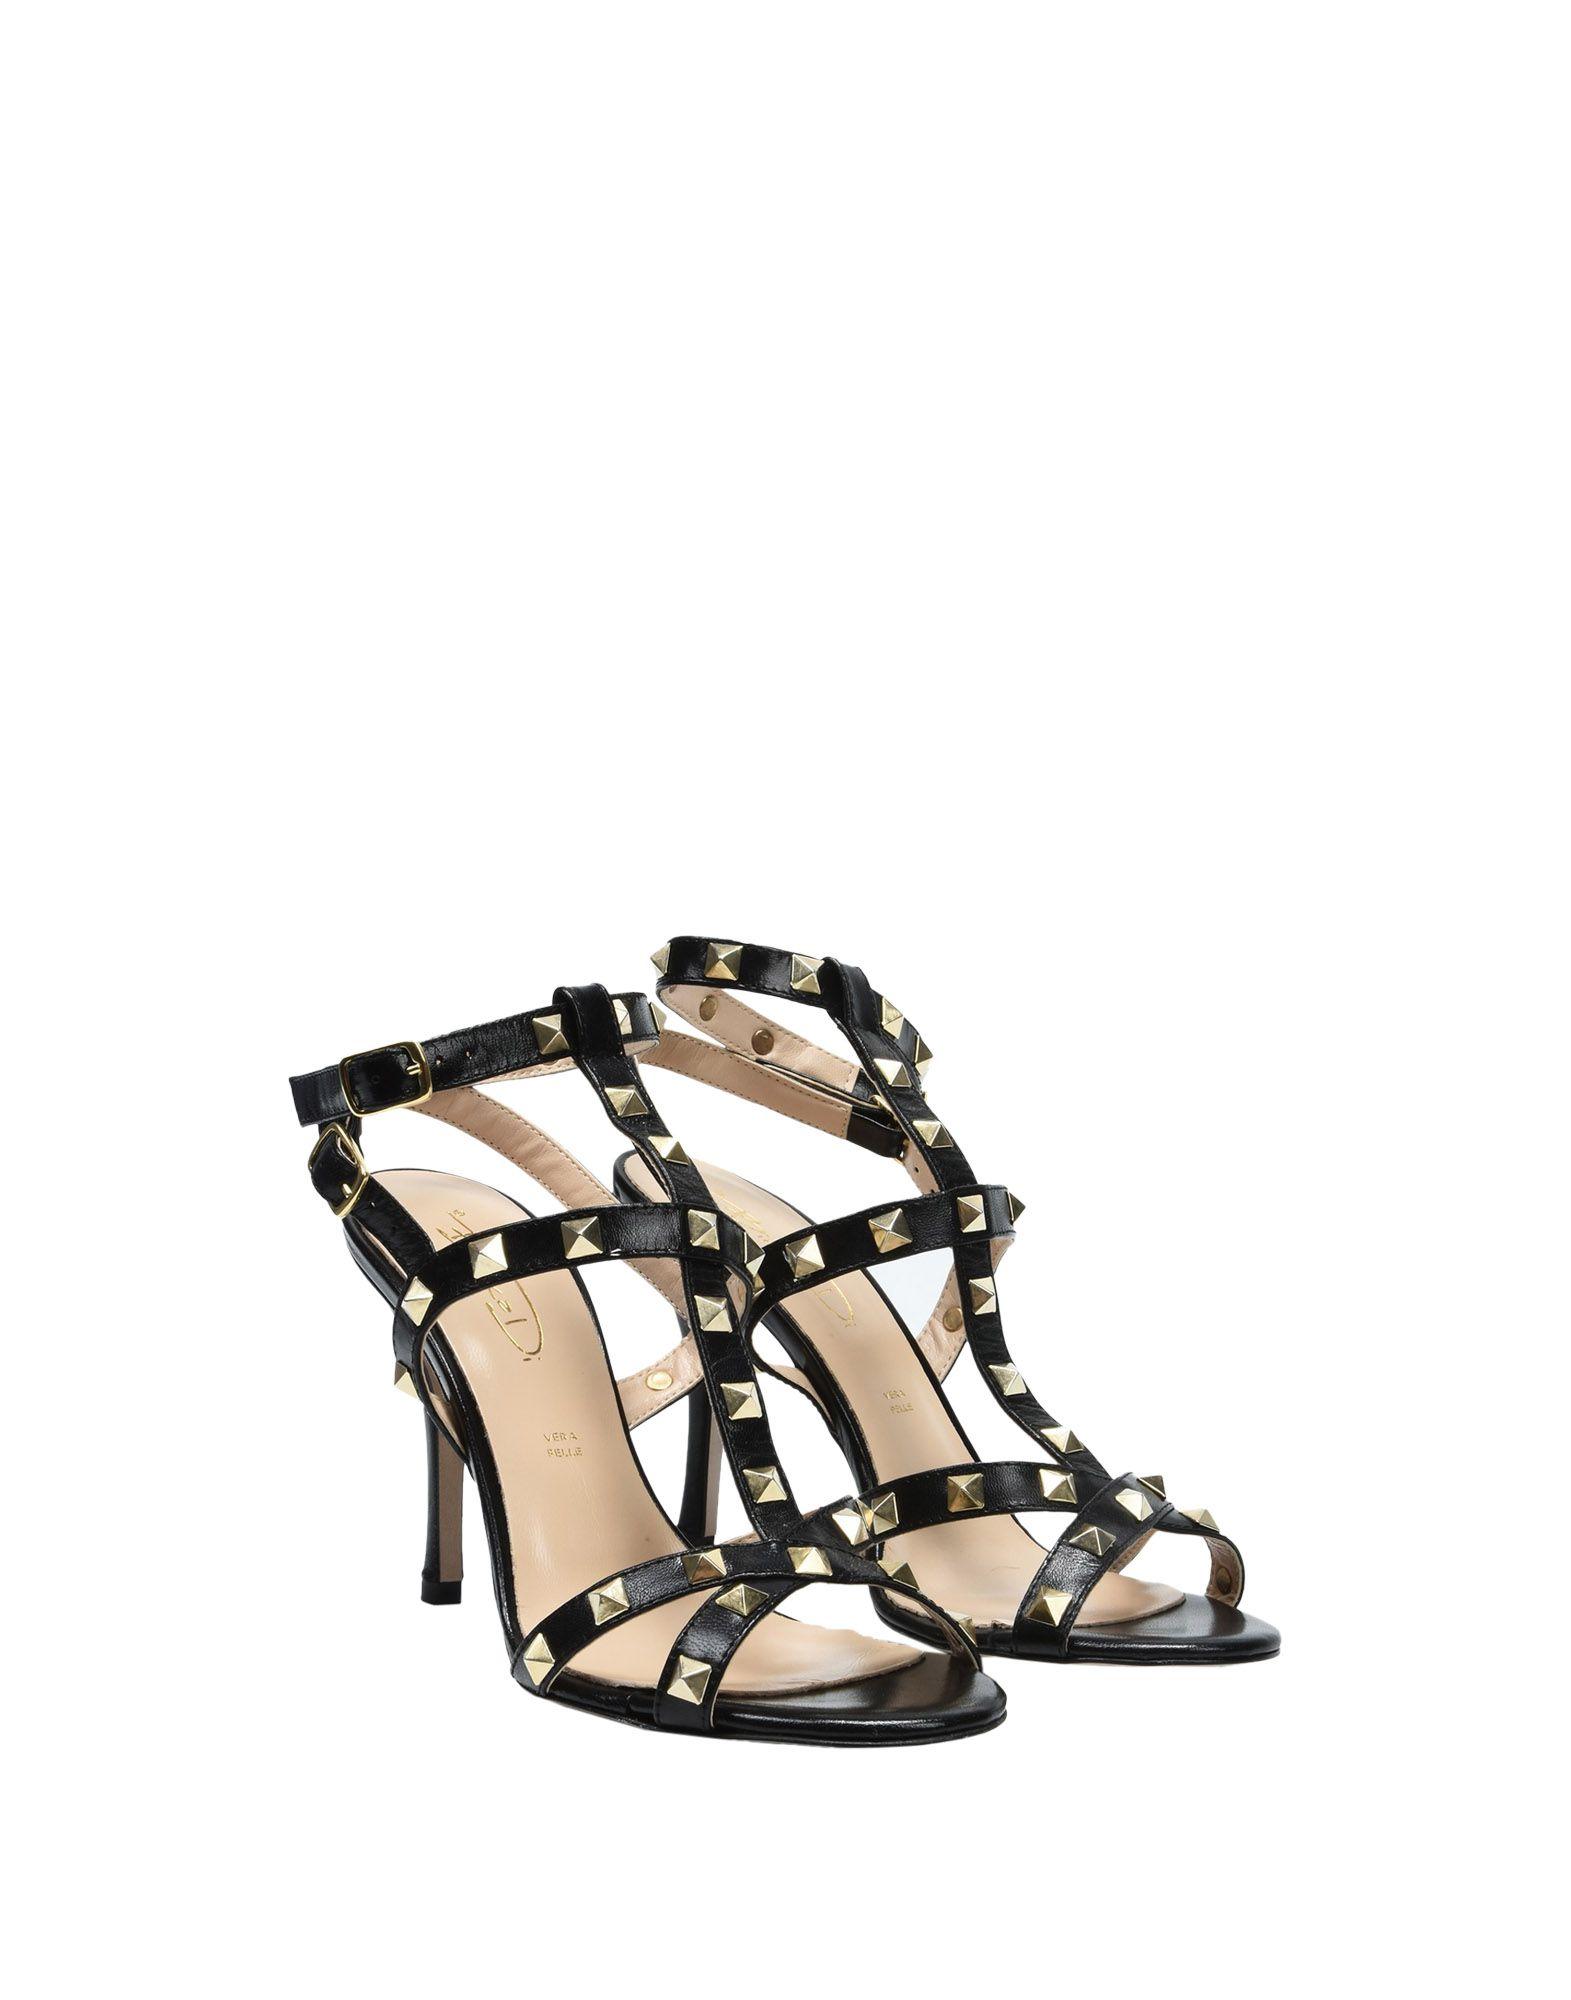 Bianca Di  Sandalen Damen  Di 11474943WS Gute Qualität beliebte Schuhe 0353d1